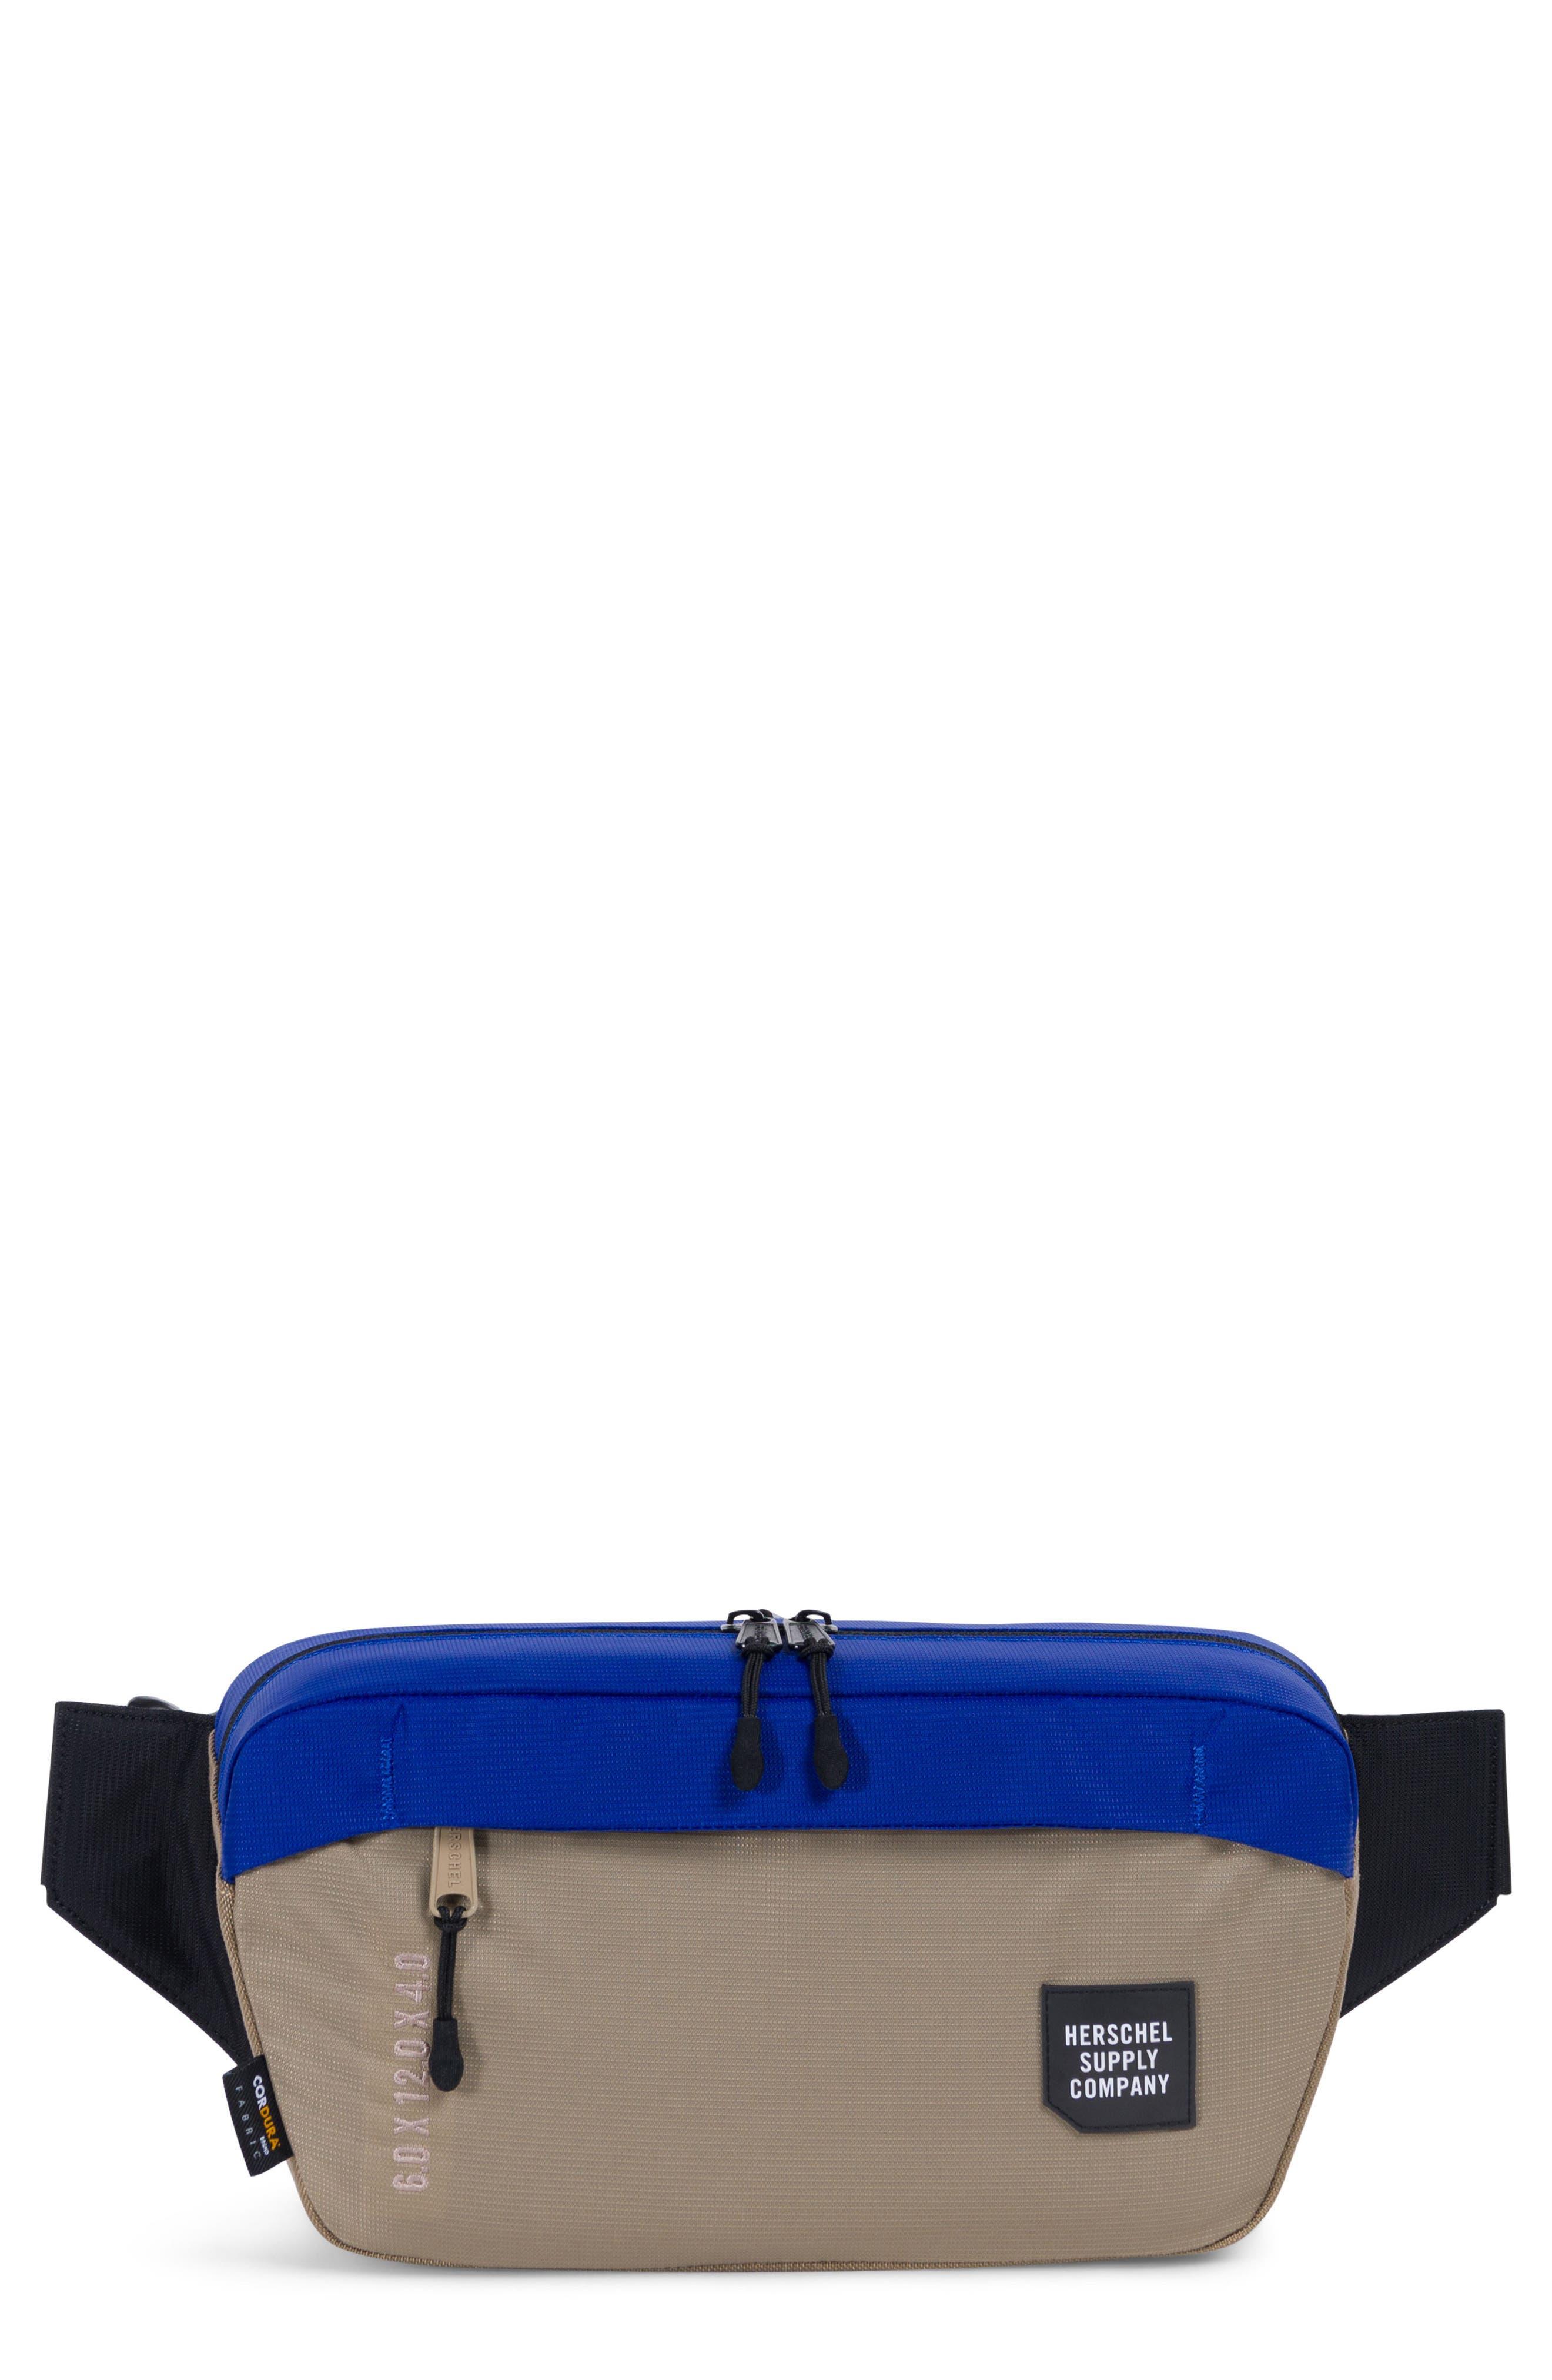 Main Image - Herschel Supply Co. Tour Trail Belt Bag